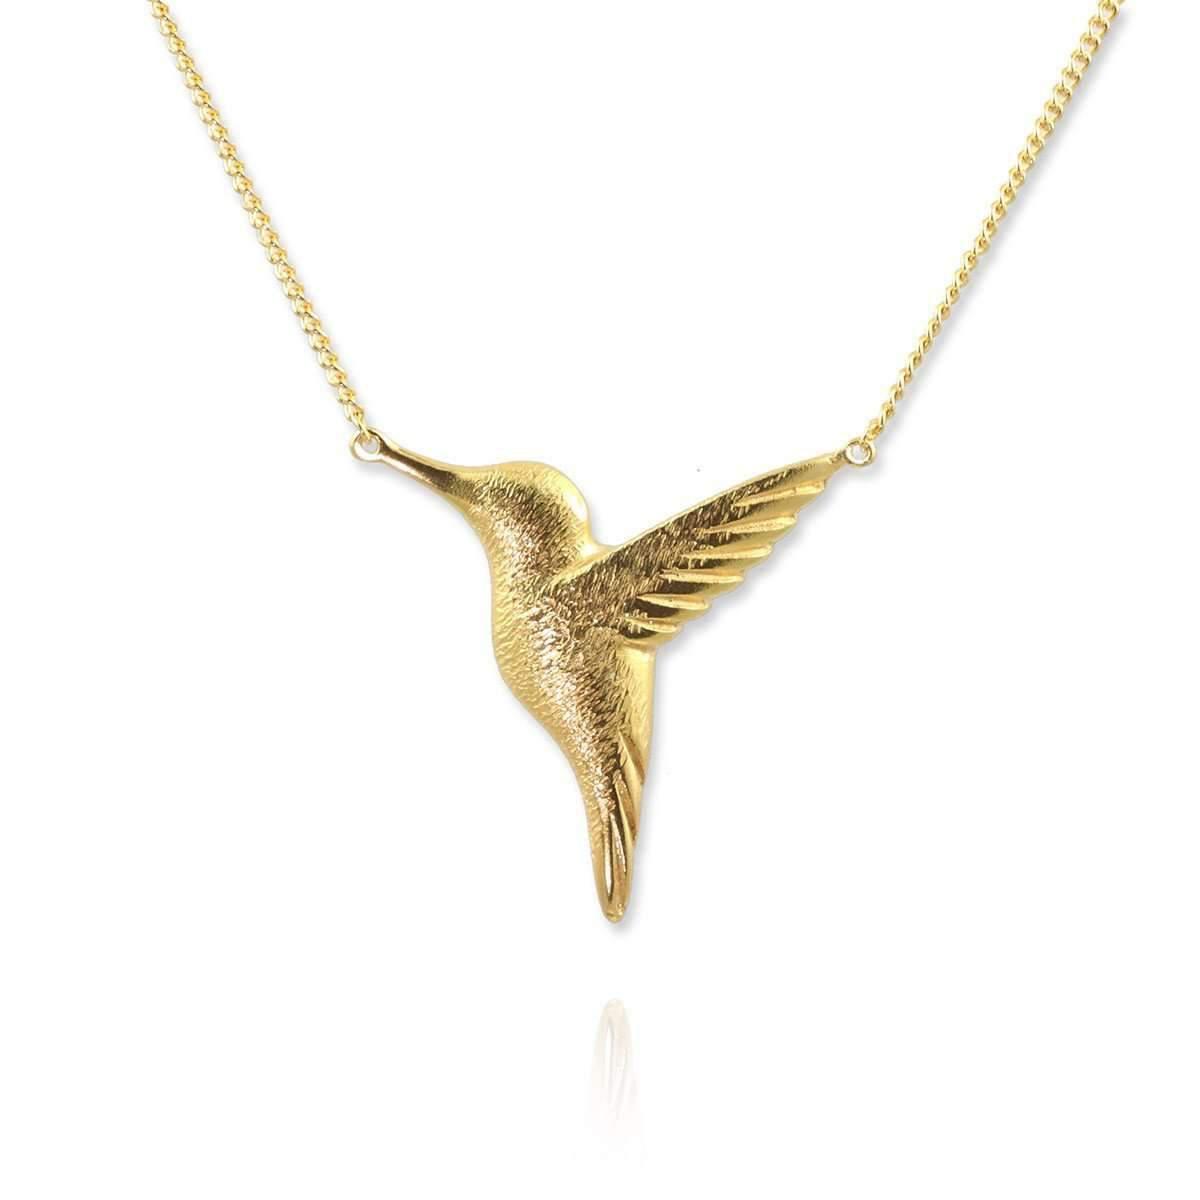 Jana Reinhardt Small Sterling Silver Hummingbird Necklace efraR43MwP